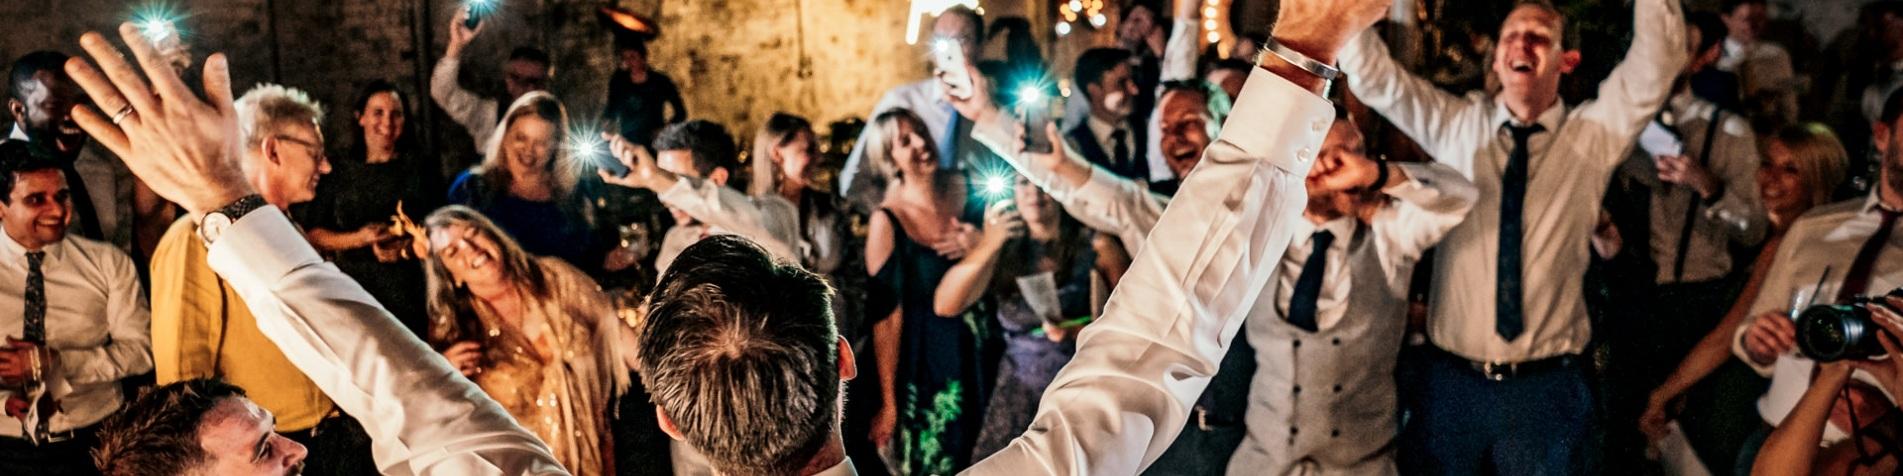 Last Dance Wedding Songs | 50+ Last Dance Songs Ideas